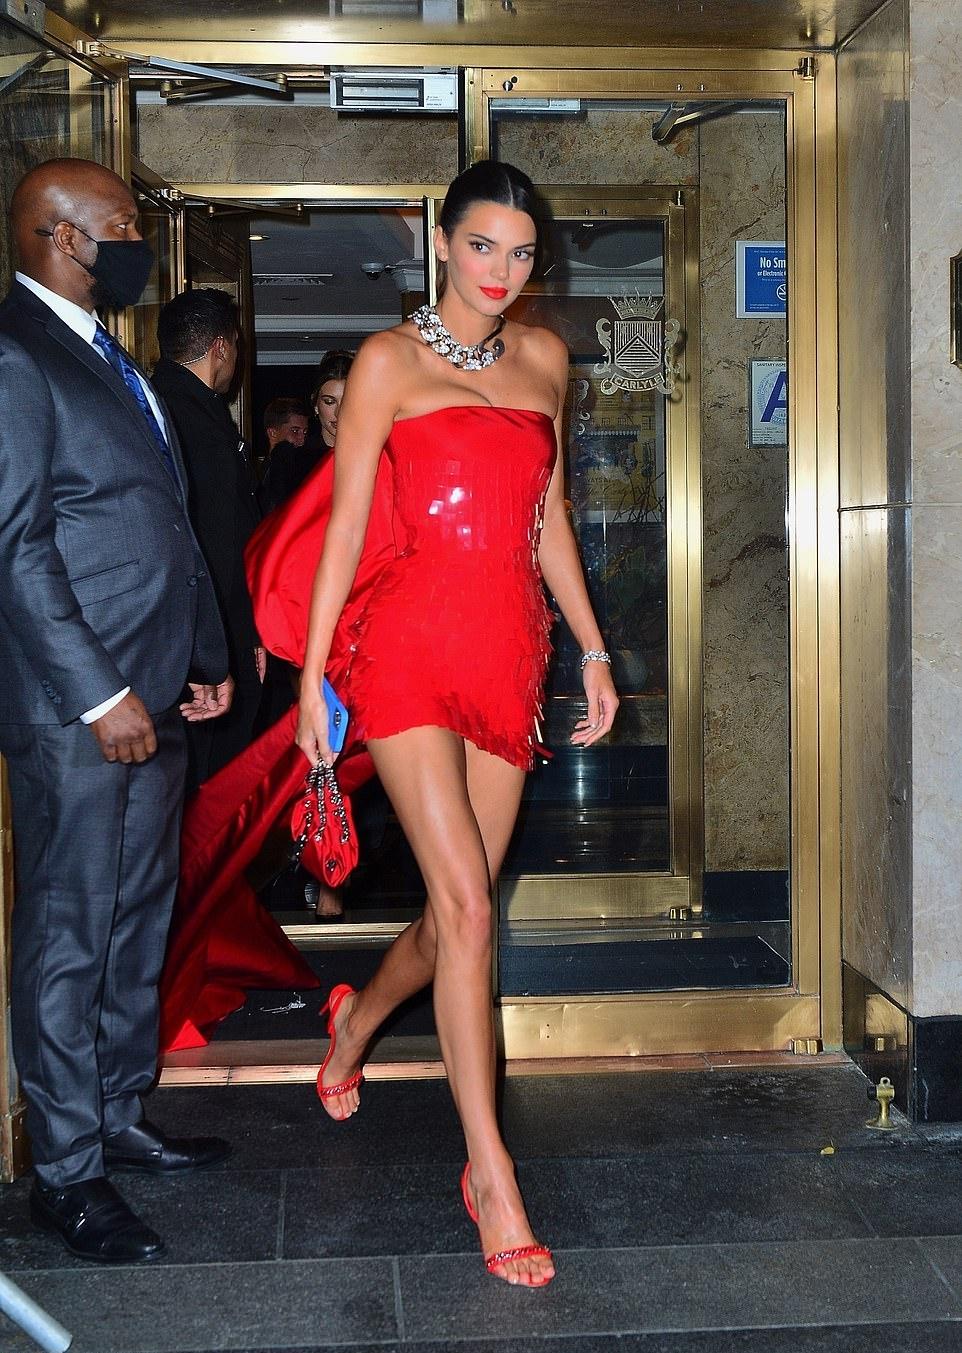 Kendall Jenner donning embellished red slingback sandals with stiletto heels